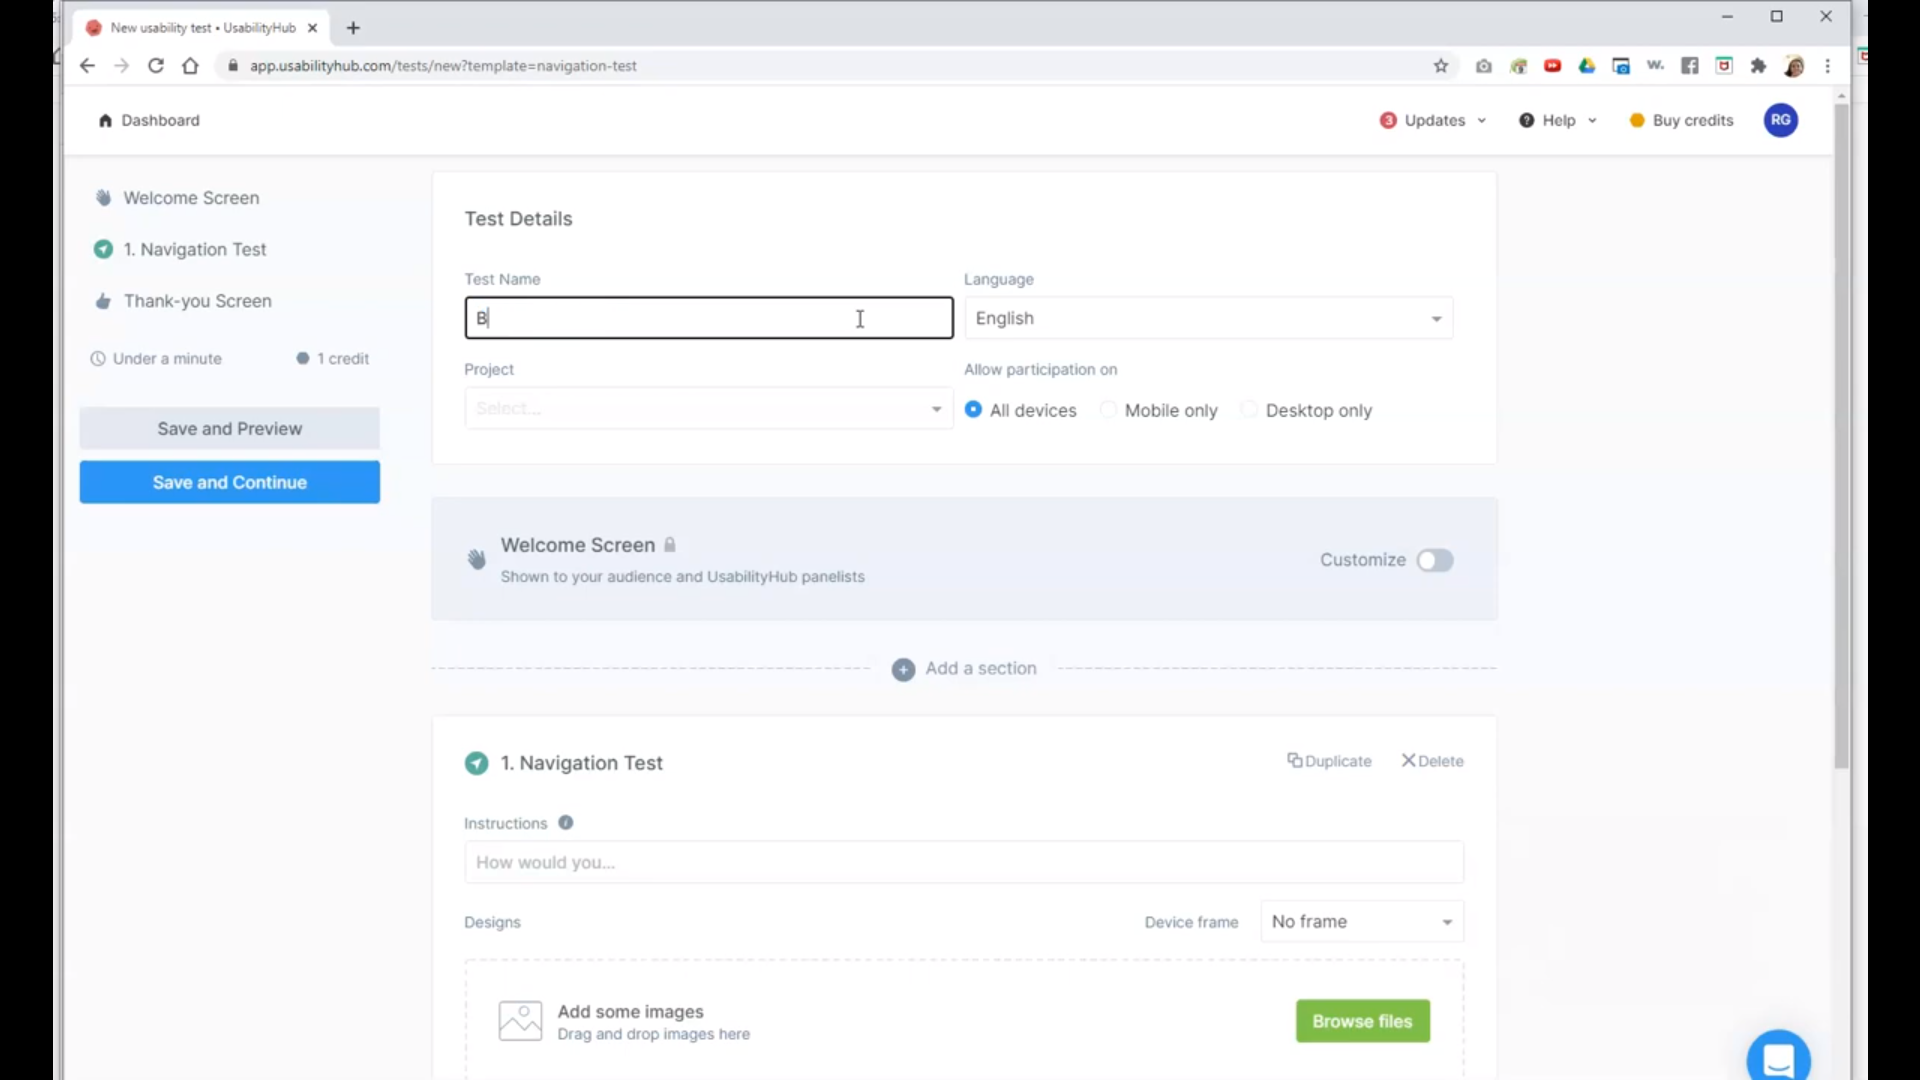 UsabilityHub create new tests